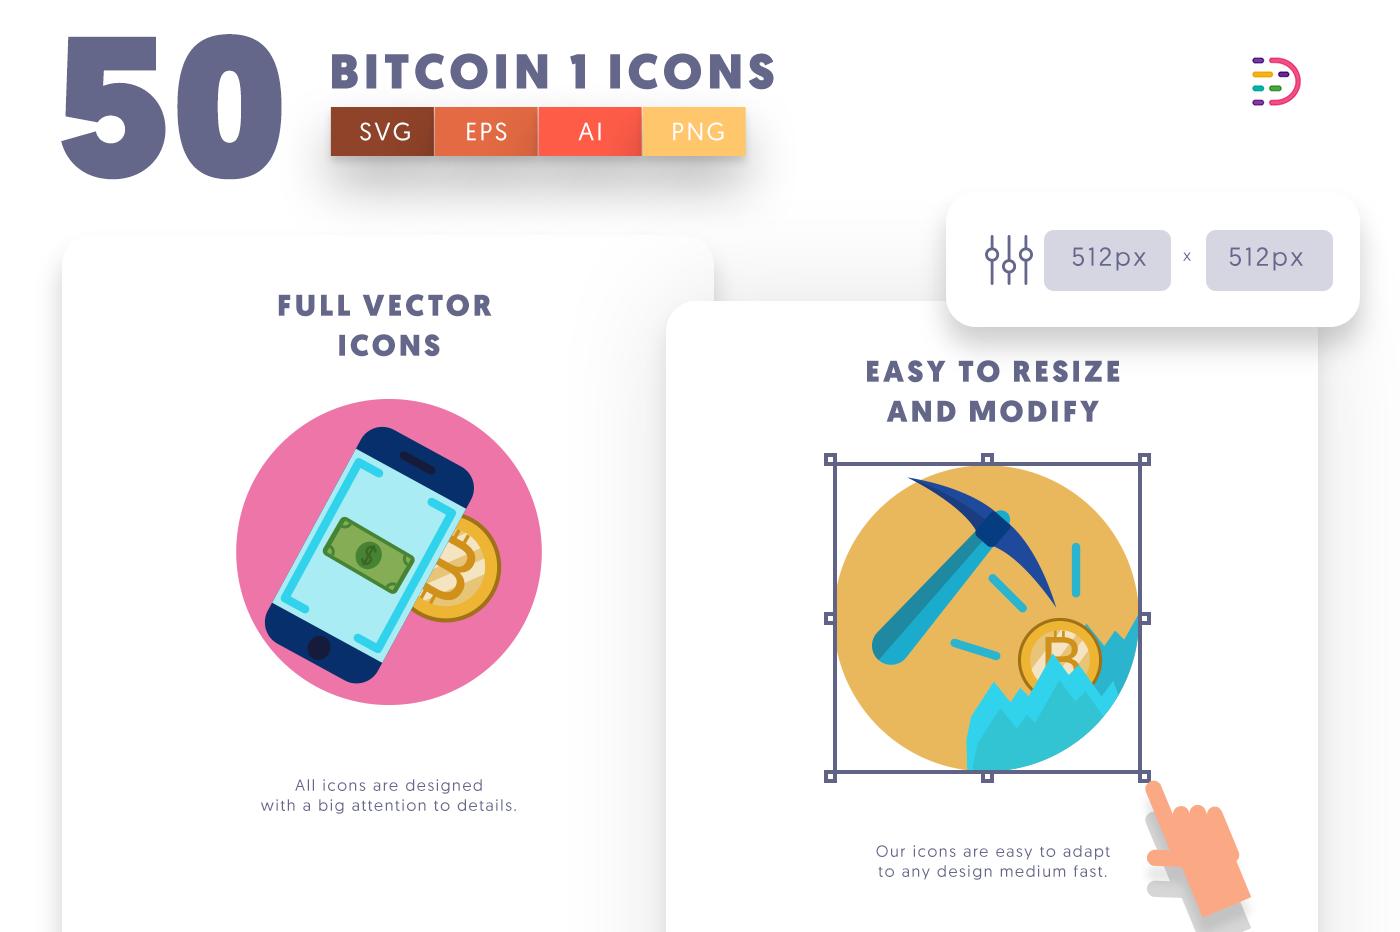 Full vector 50Bitcoin1 Icons